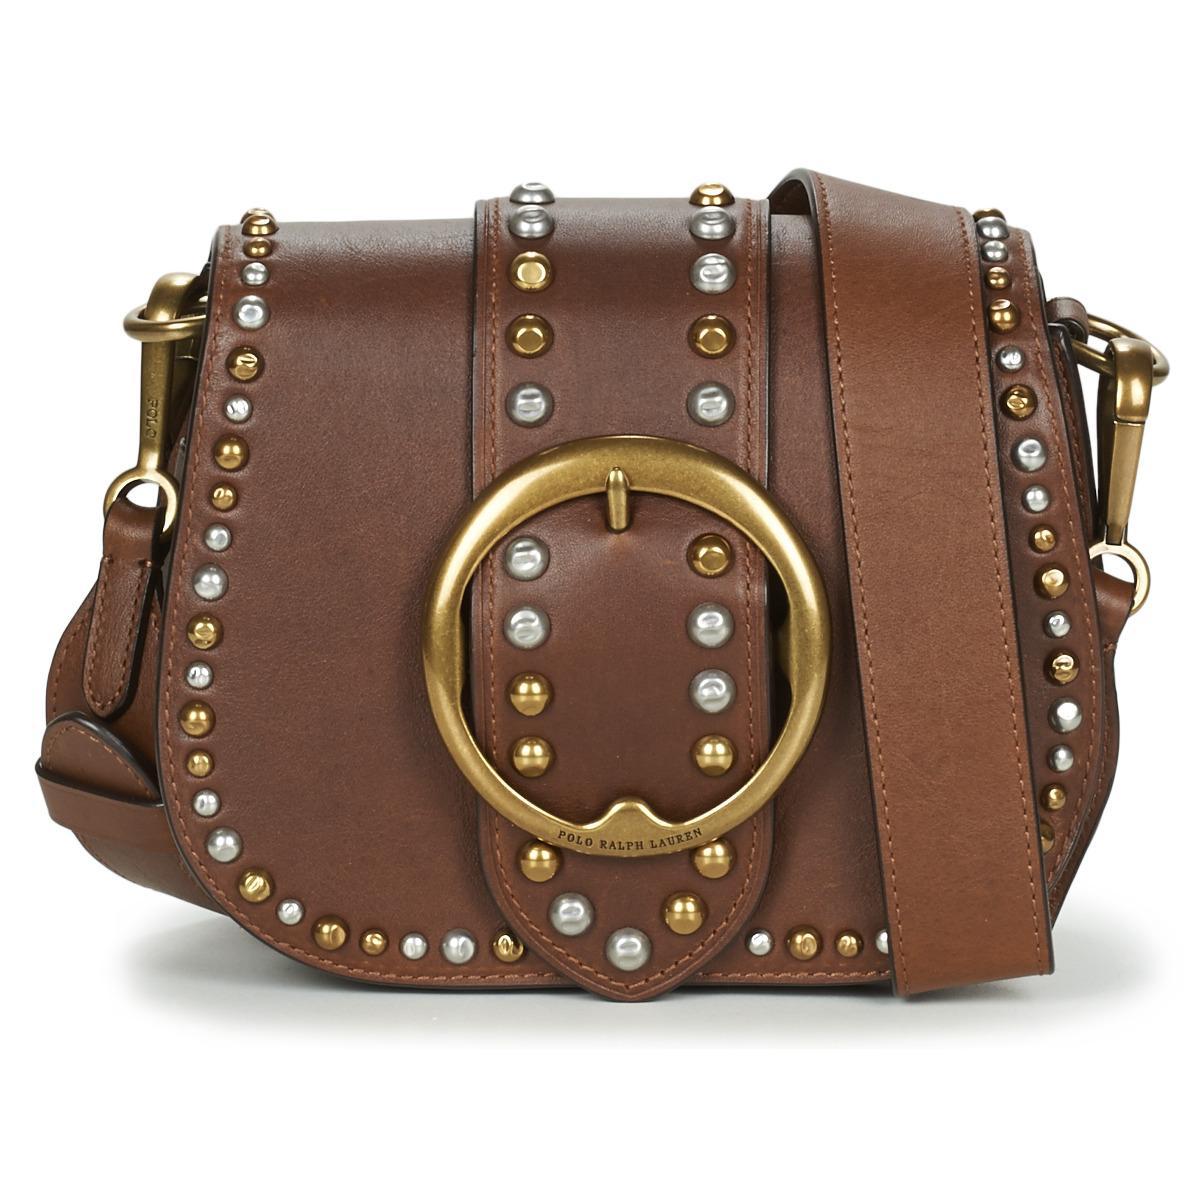 e57ecc277bc8 Polo Ralph Lauren Belt Saddle-crossbody Women s Shoulder Bag In ...